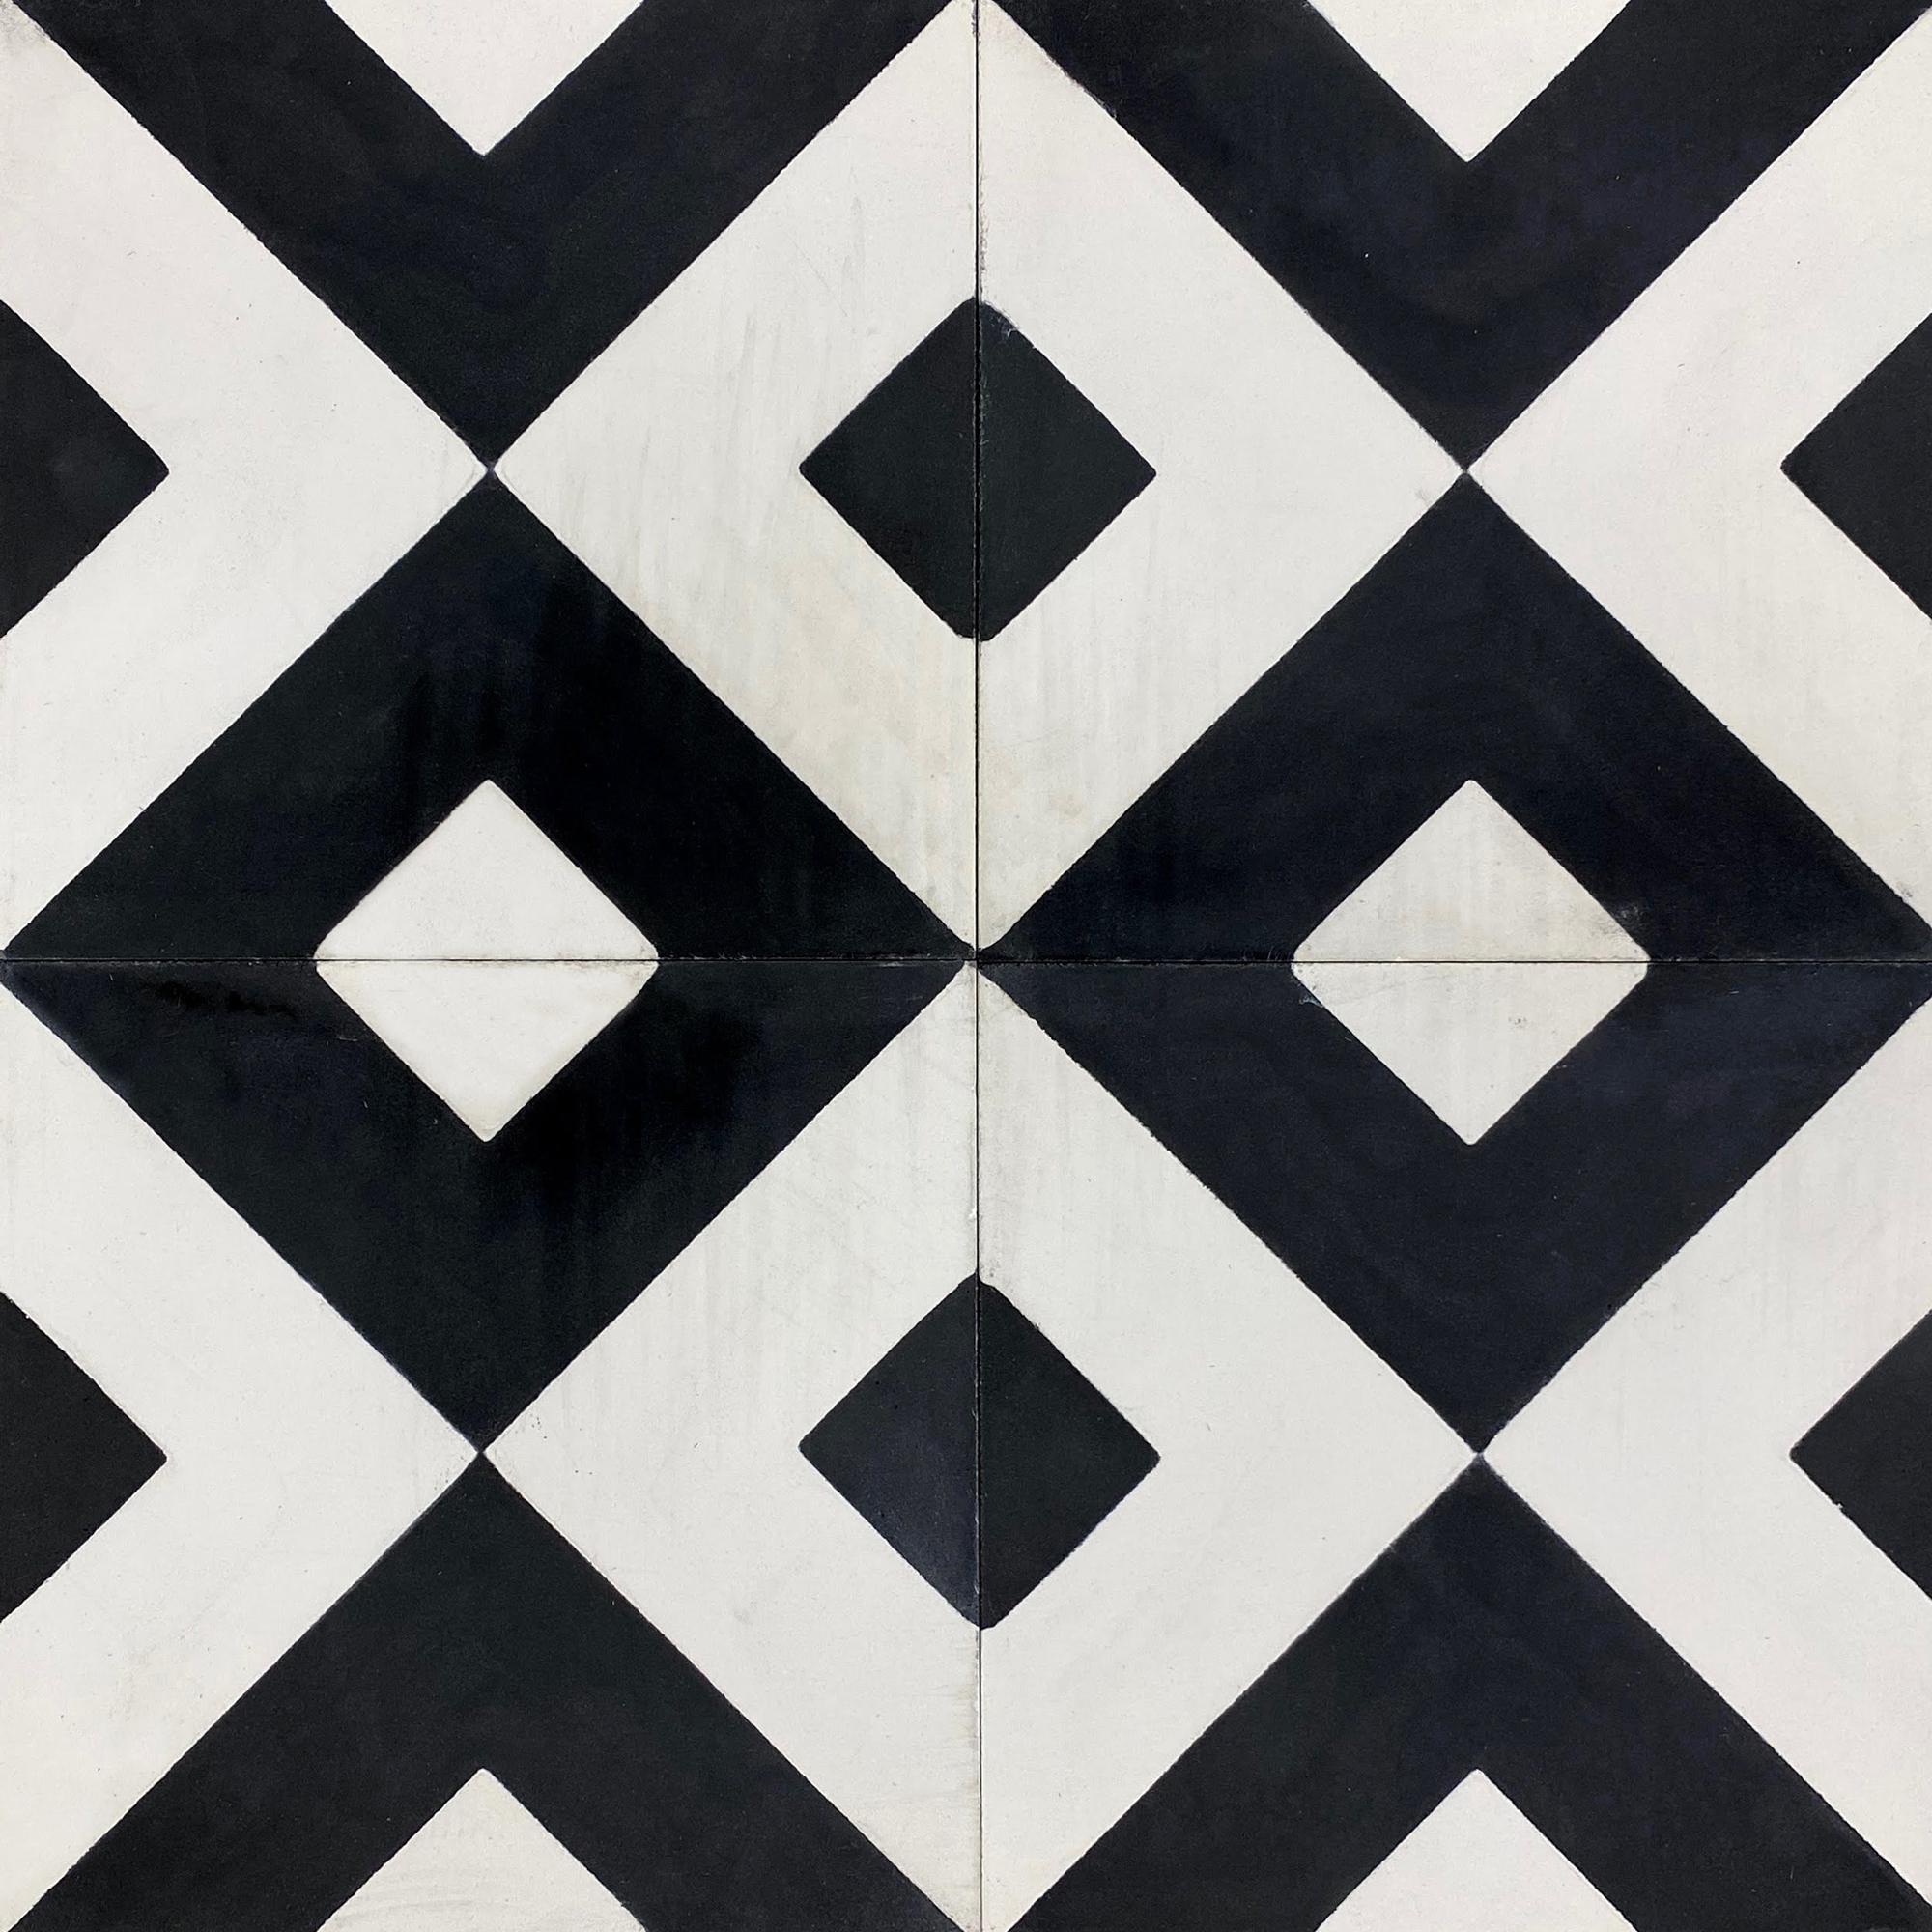 Koni Cement Tile KCT 02